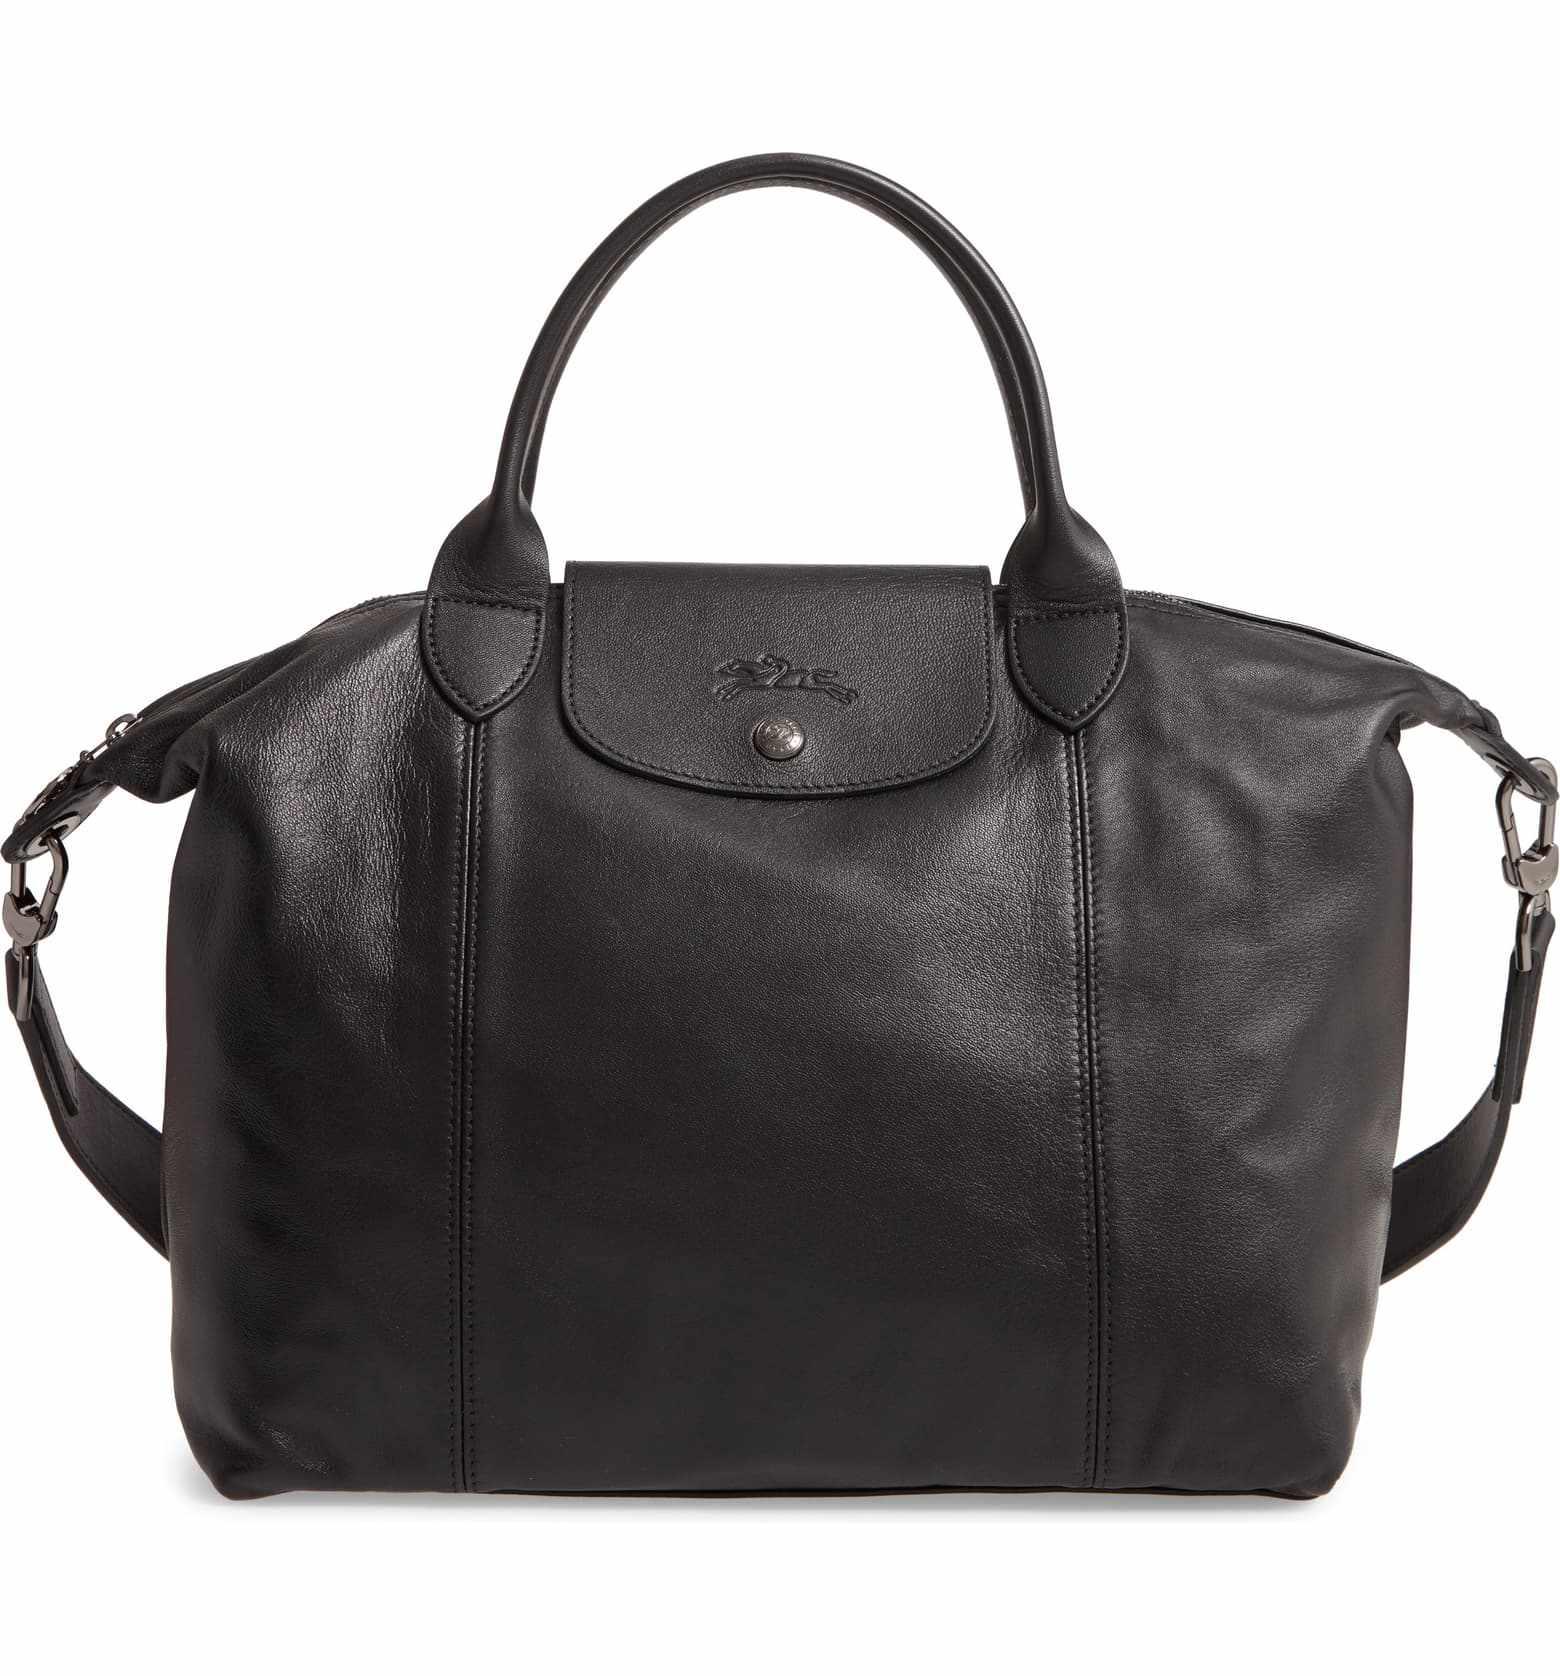 Medium Le Pliage Cuir Leather Top Handle Tote